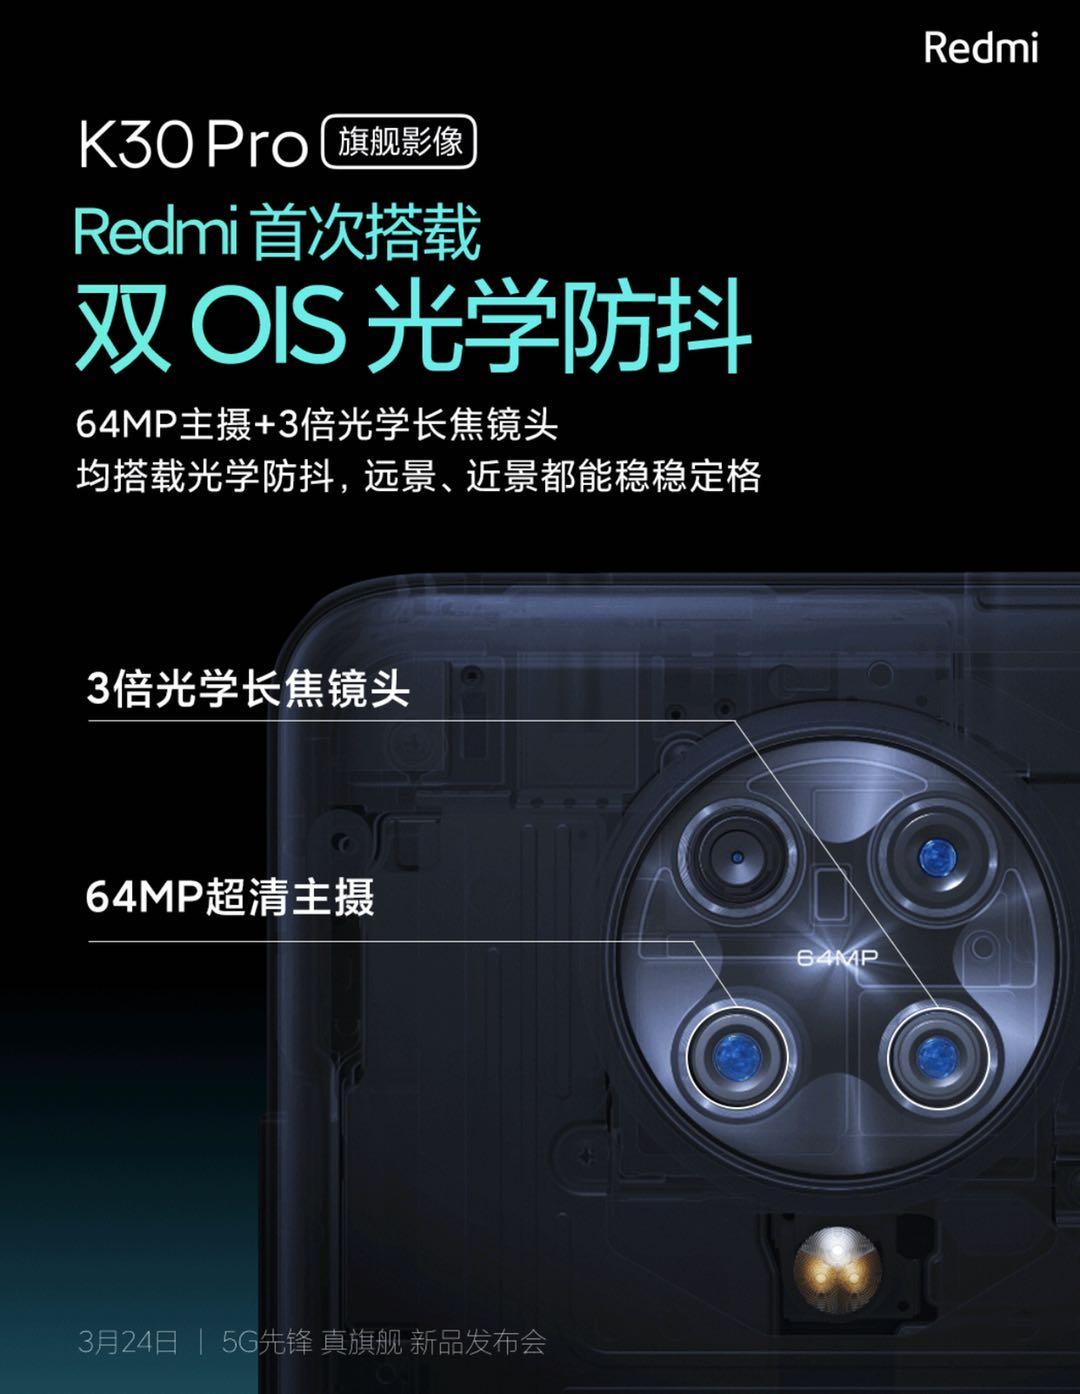 sony6400万还不够,Redmi K30 Pro配用光学防抖,立即上2个!